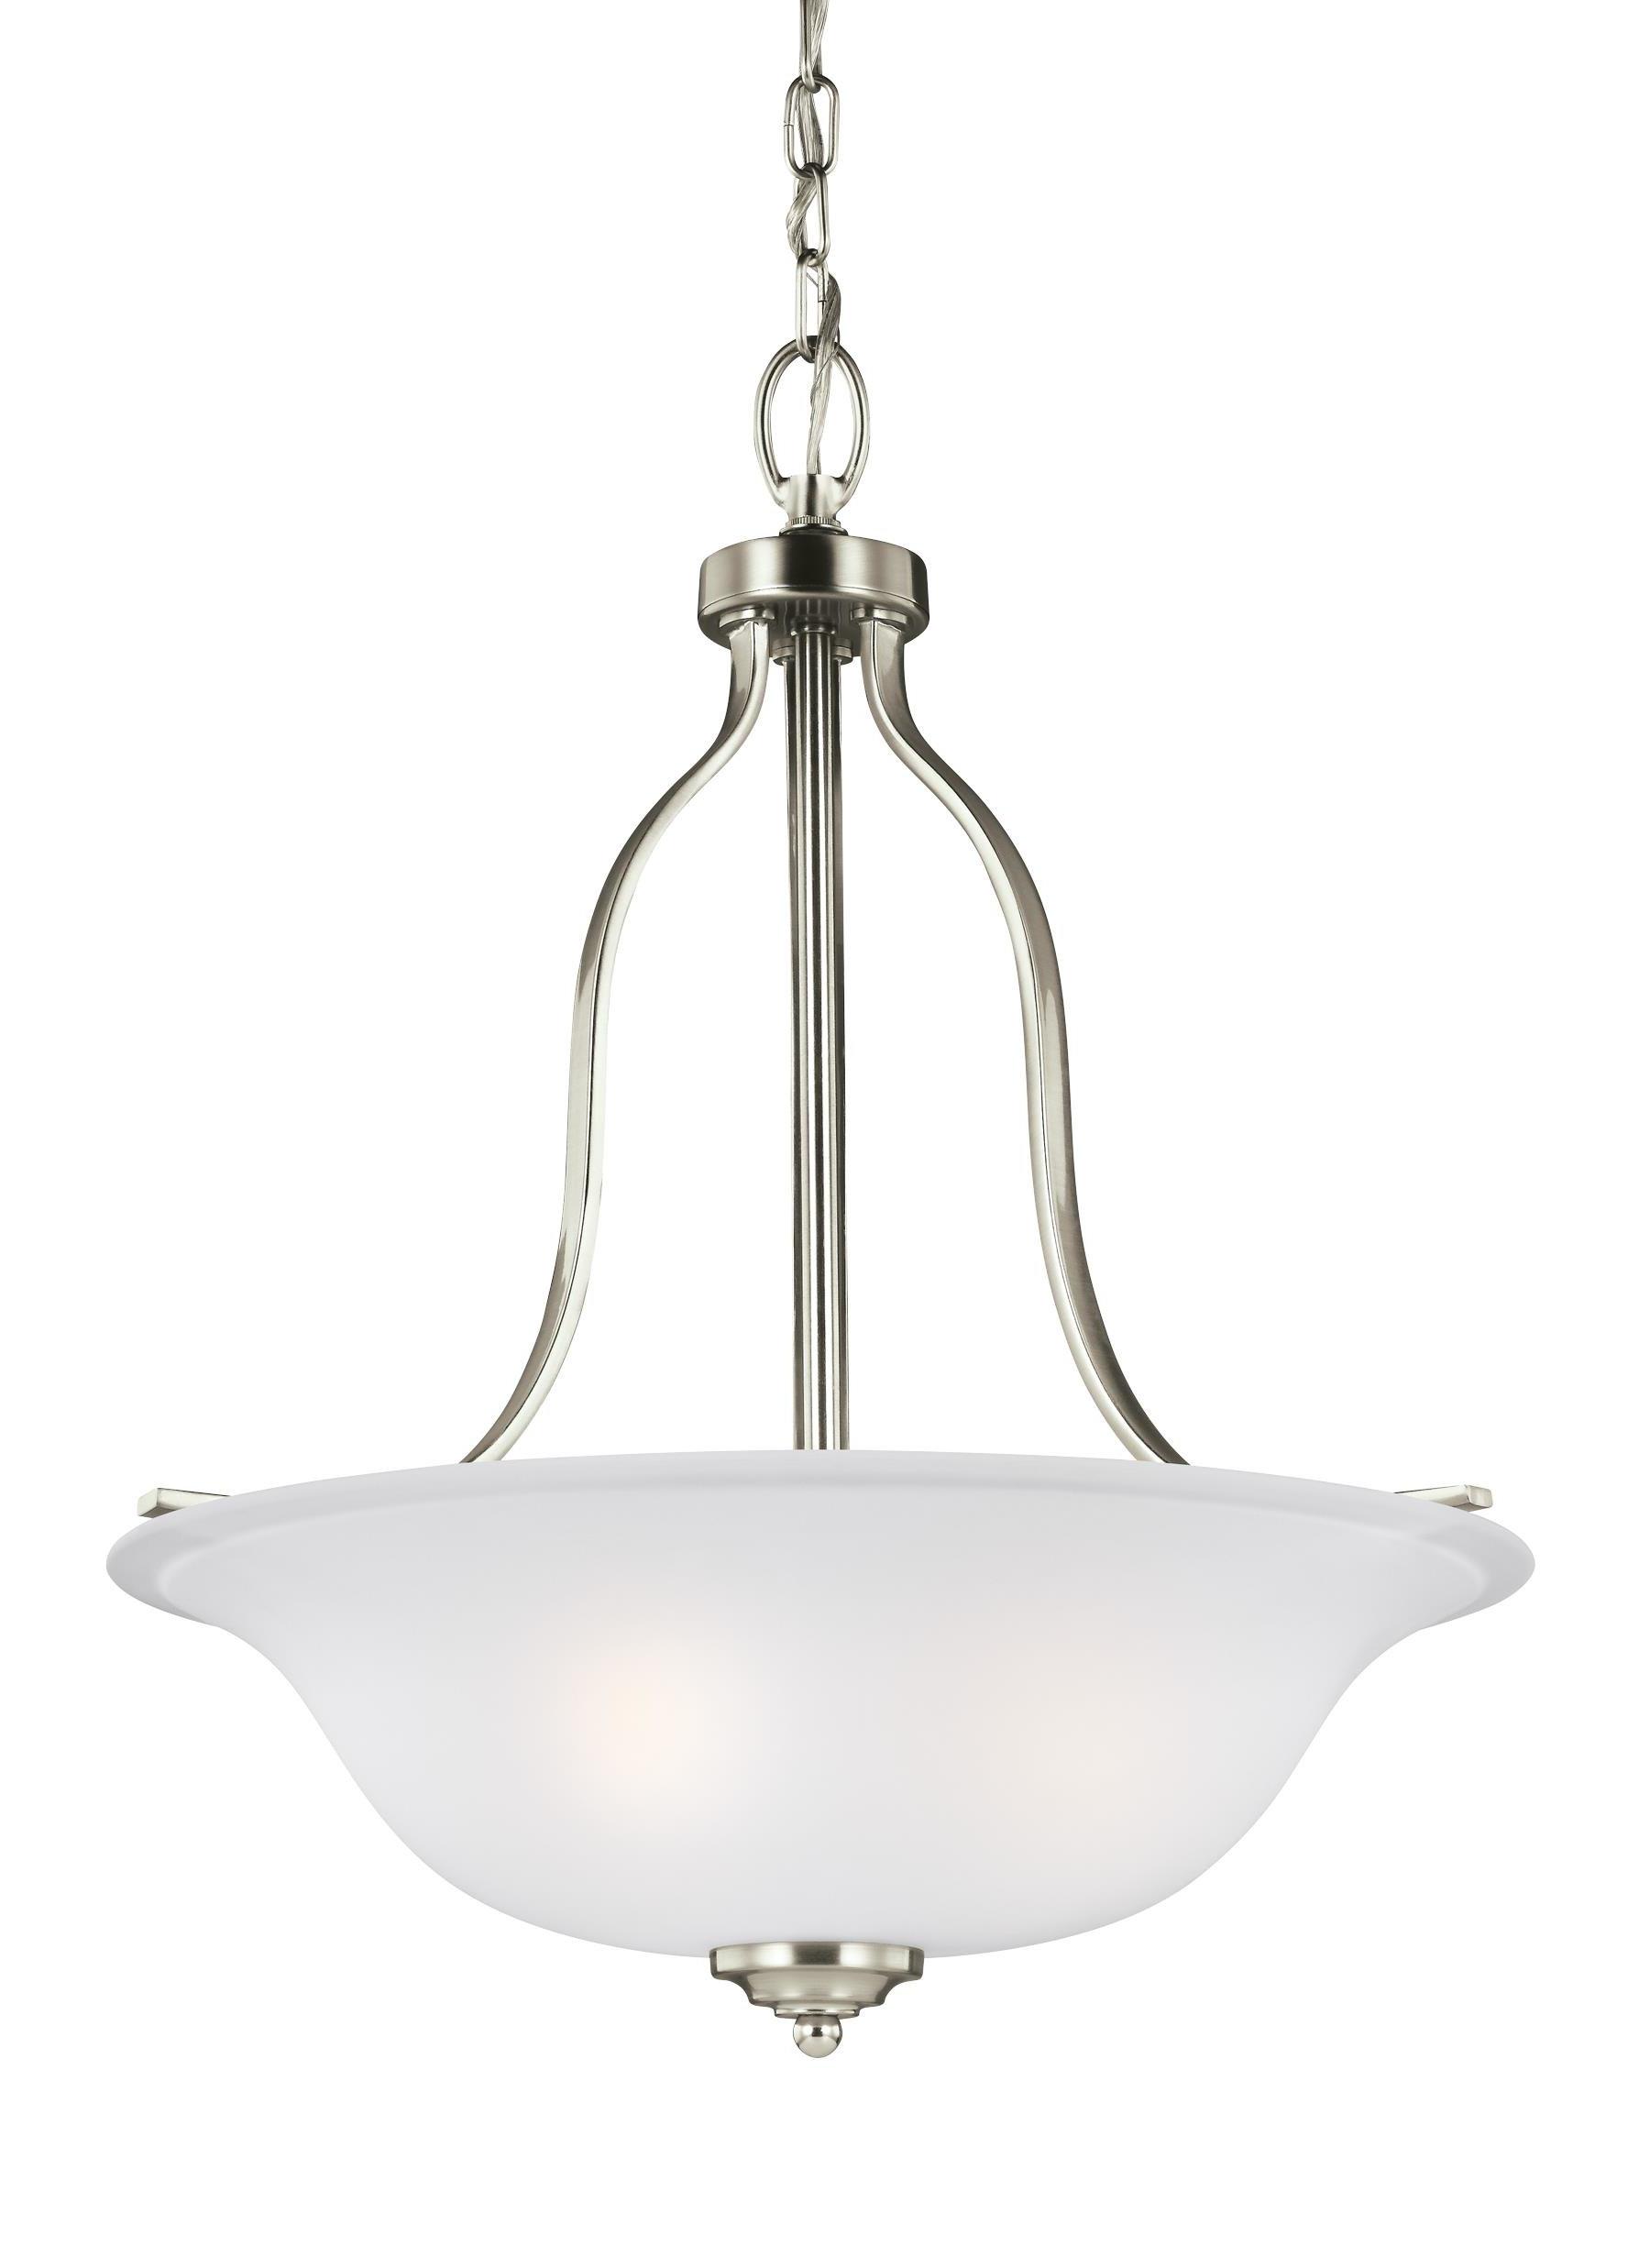 Newent 3 Light Single Bowl Pendants Regarding Favorite Burhall 3 Light Bowl Pendant (View 20 of 25)